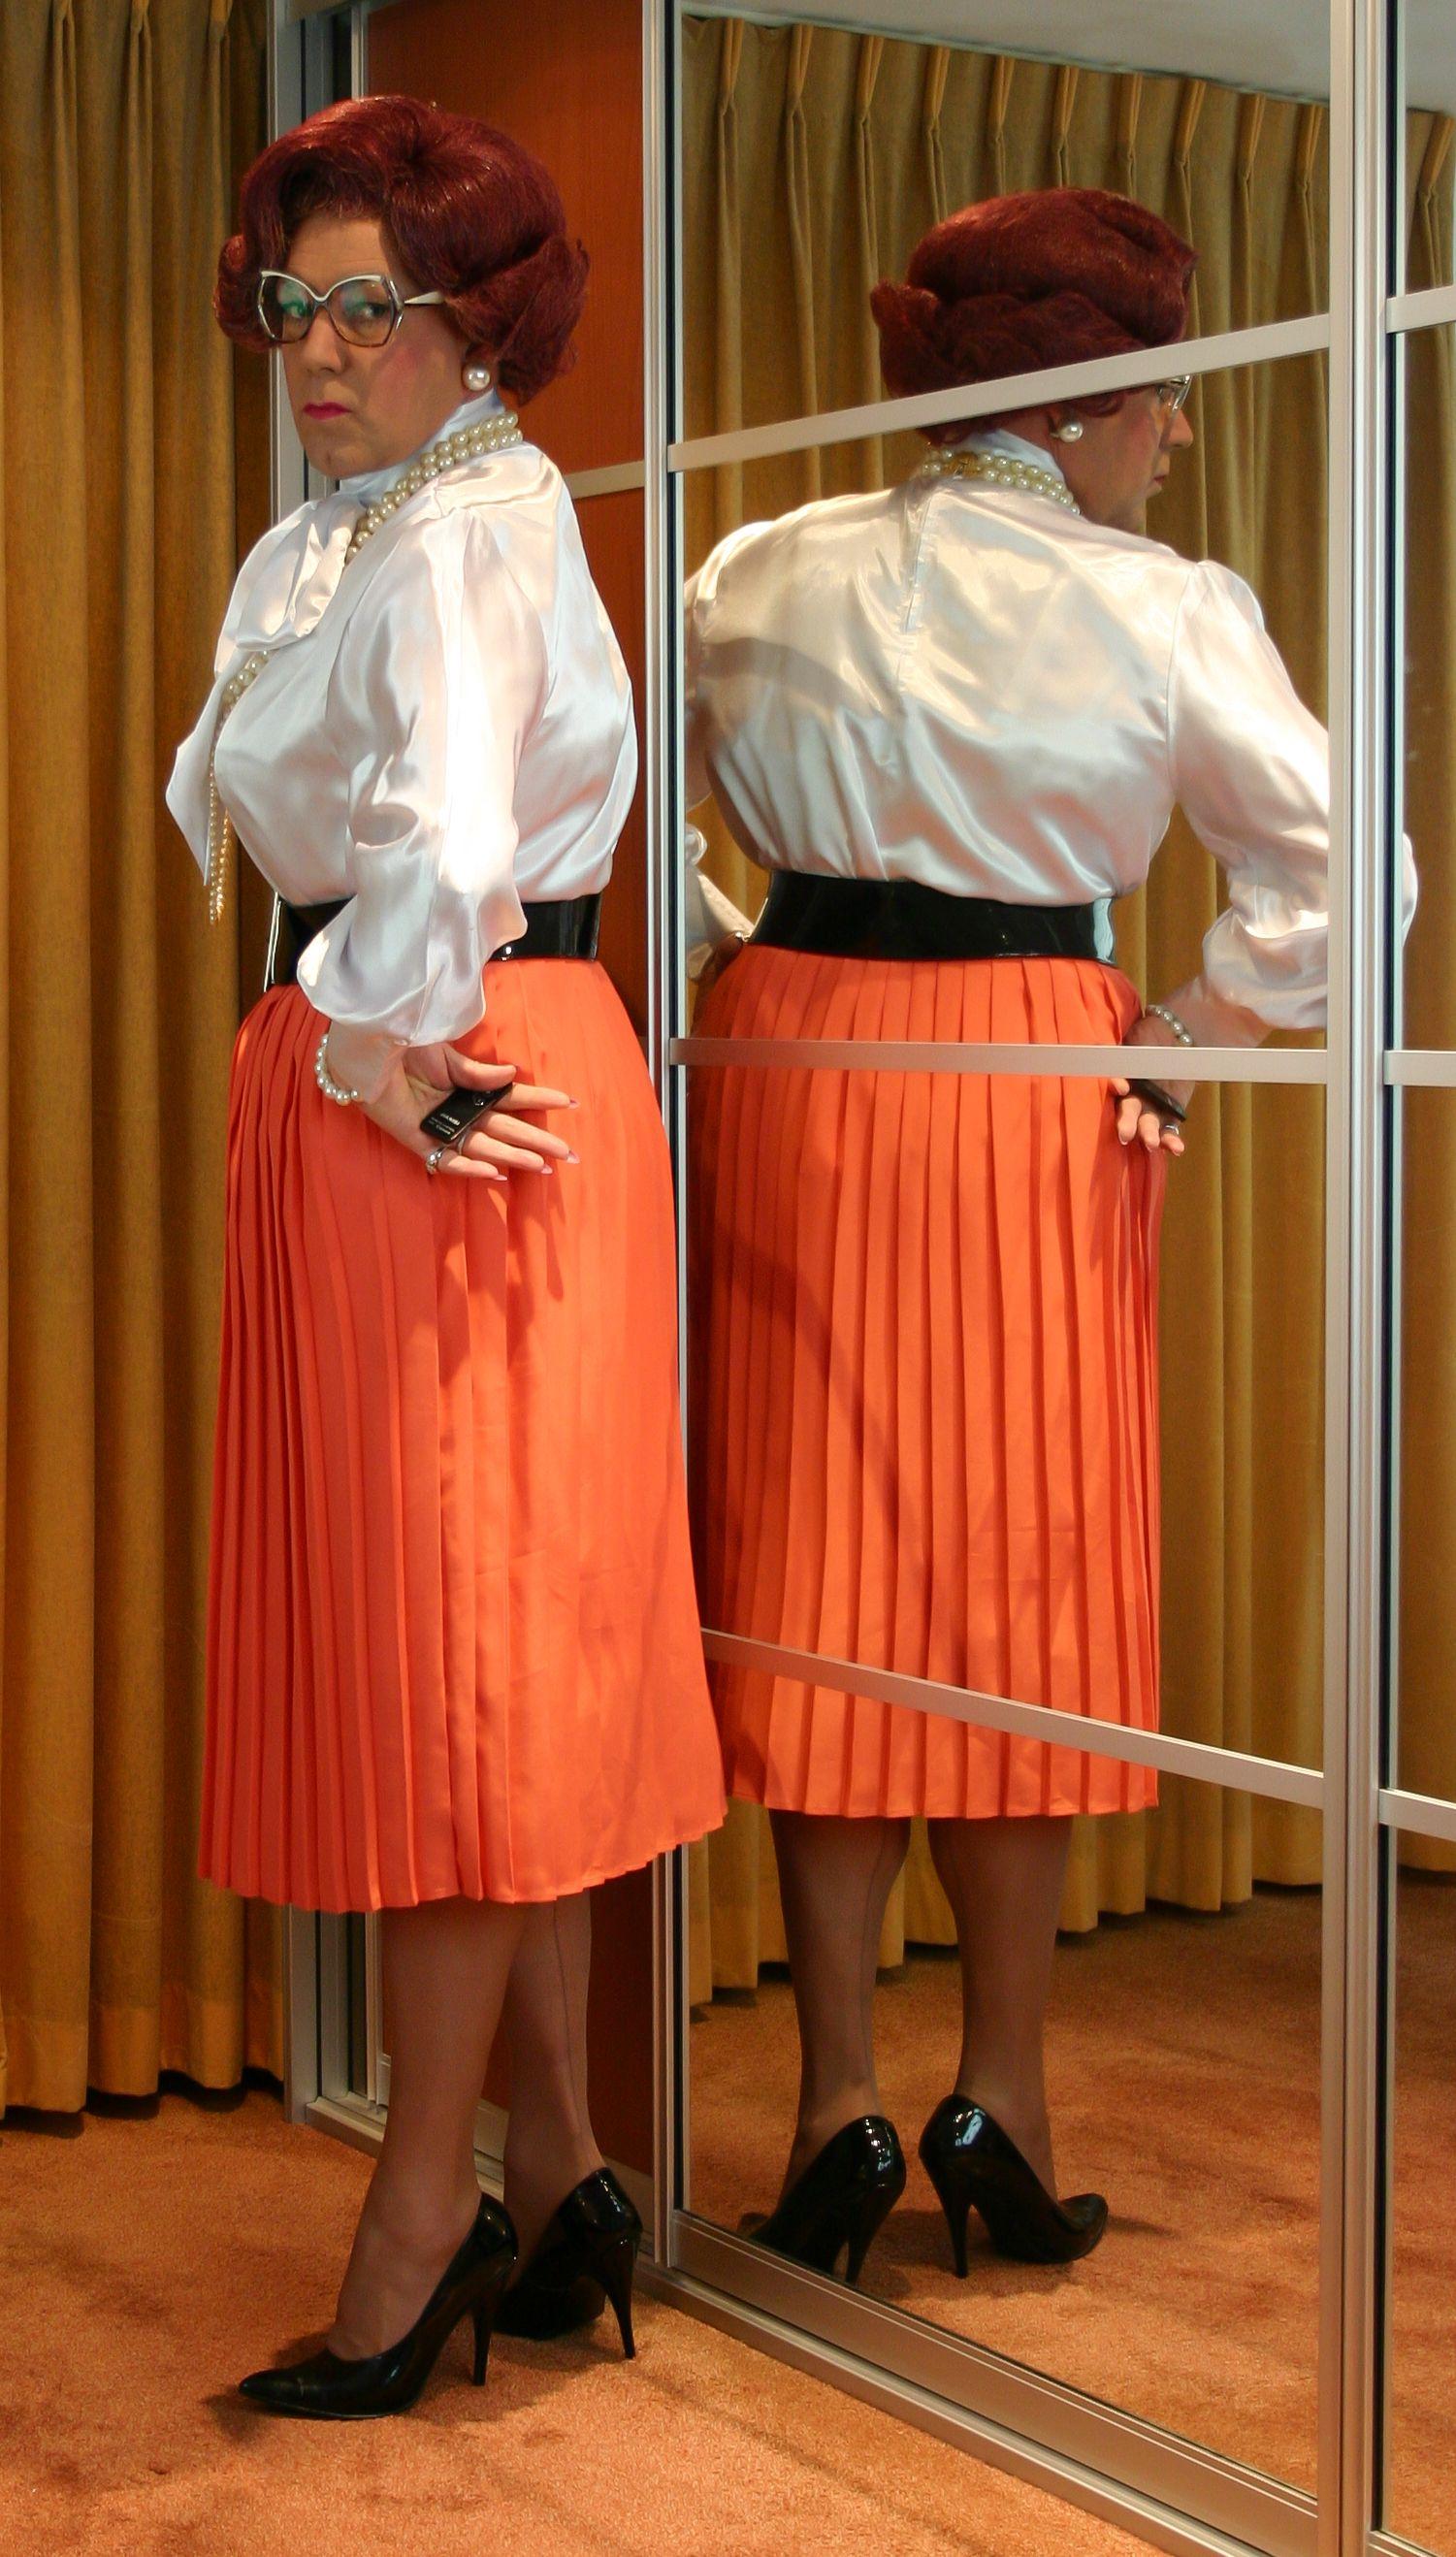 eeaa0b1f43e977 Mrs Wanda Nylon   Pleated Skirts and Dresses 2